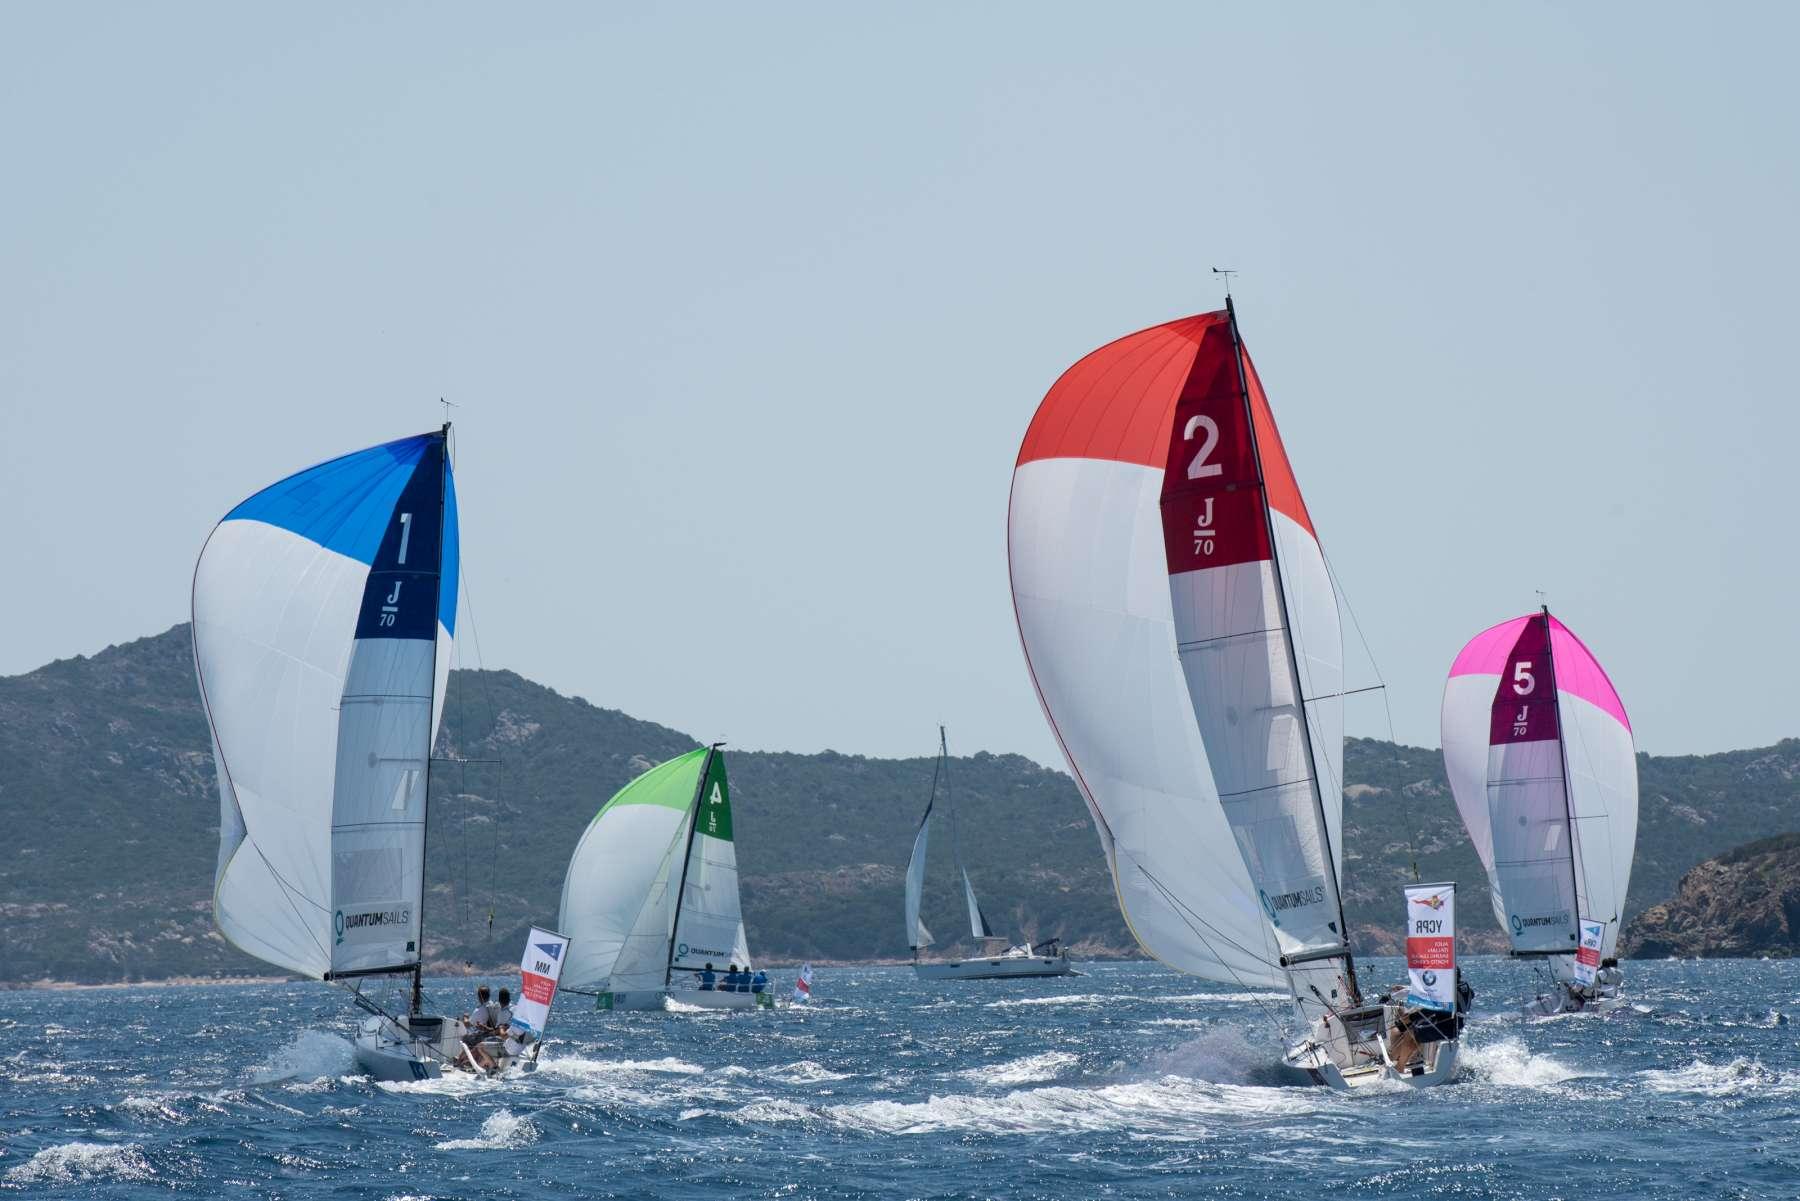 Audi - Italian Sailing League - Porto Cervo - Images Race Day 1 online - NEWS - Yacht Club Costa Smeralda